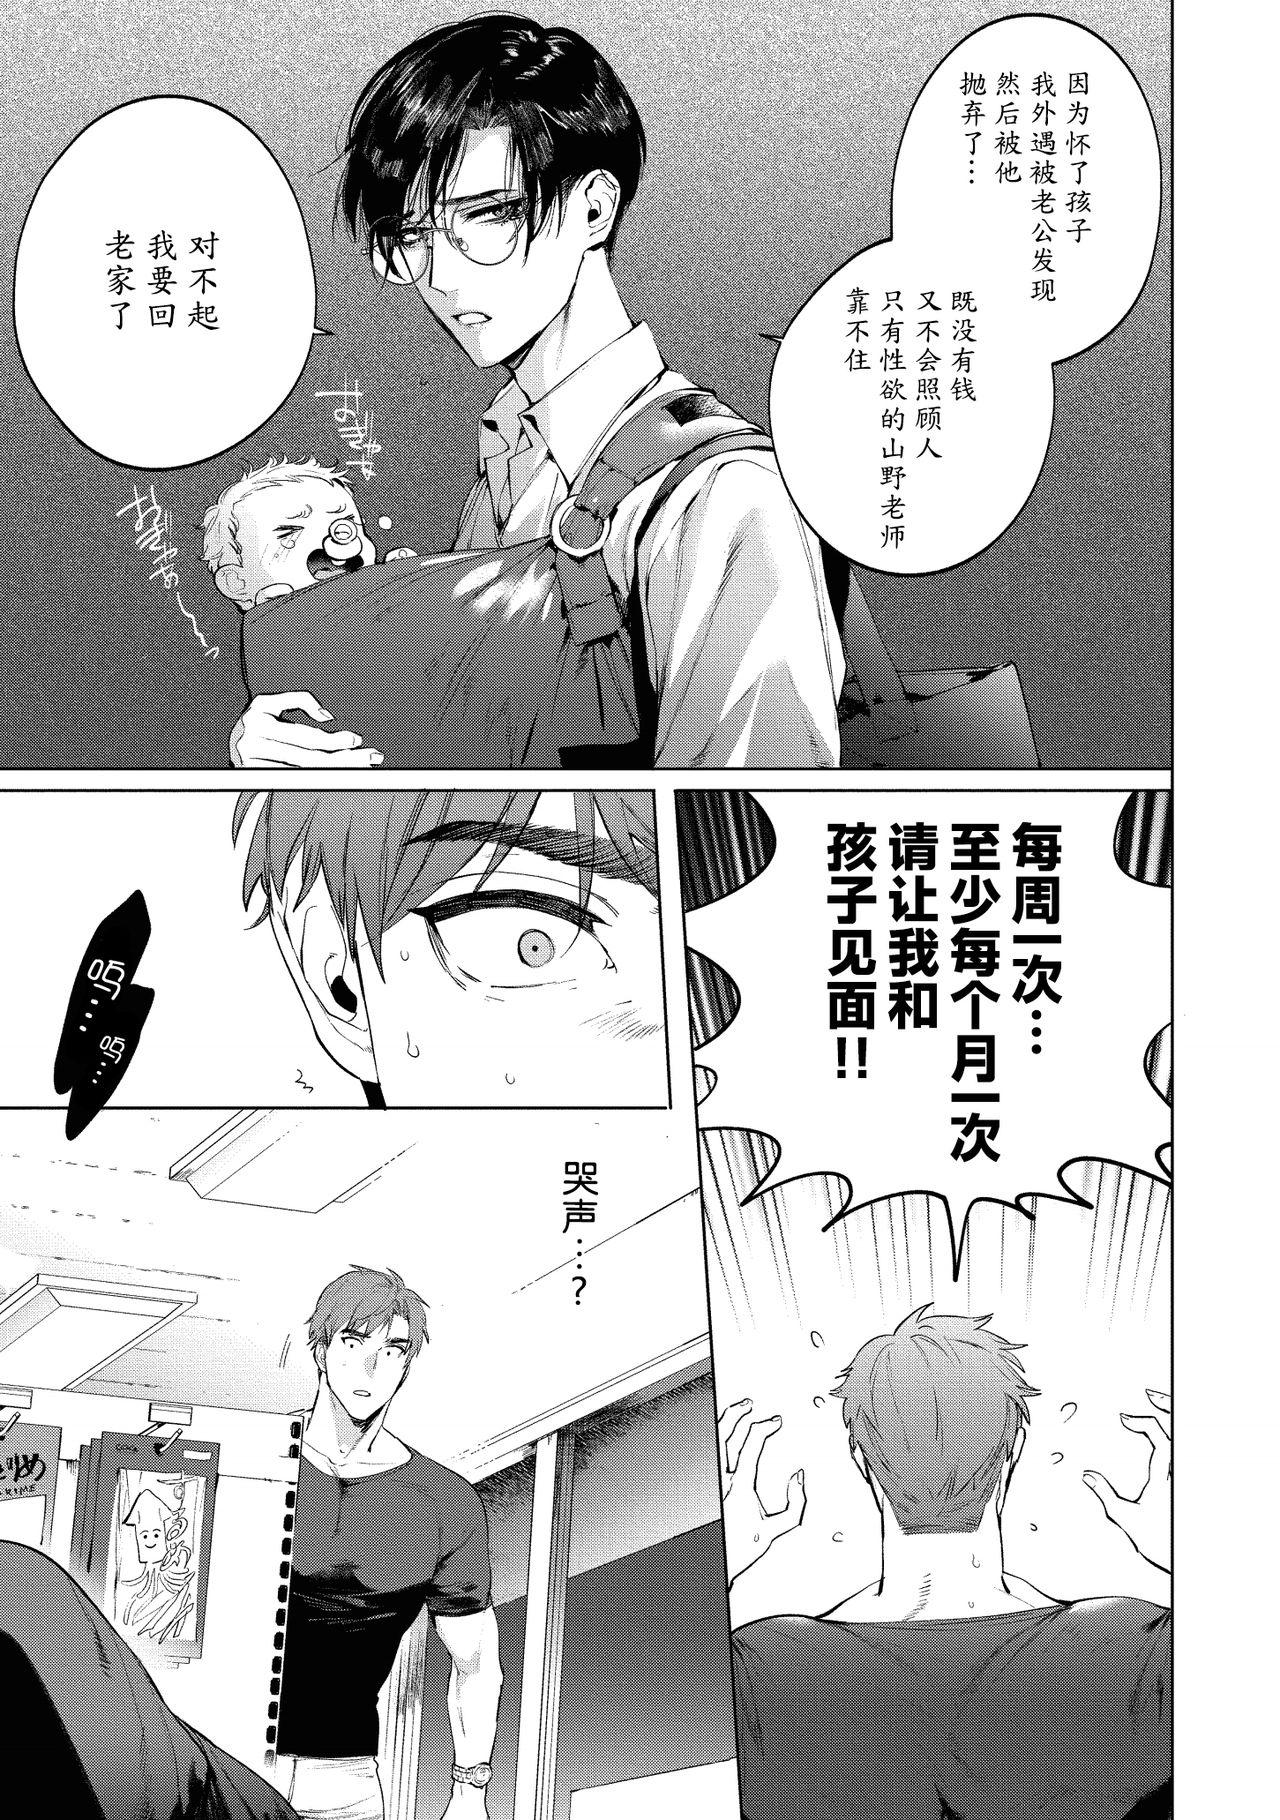 Sensei wa Benki ja Arimasen.3 | 老师不是便器。3 18